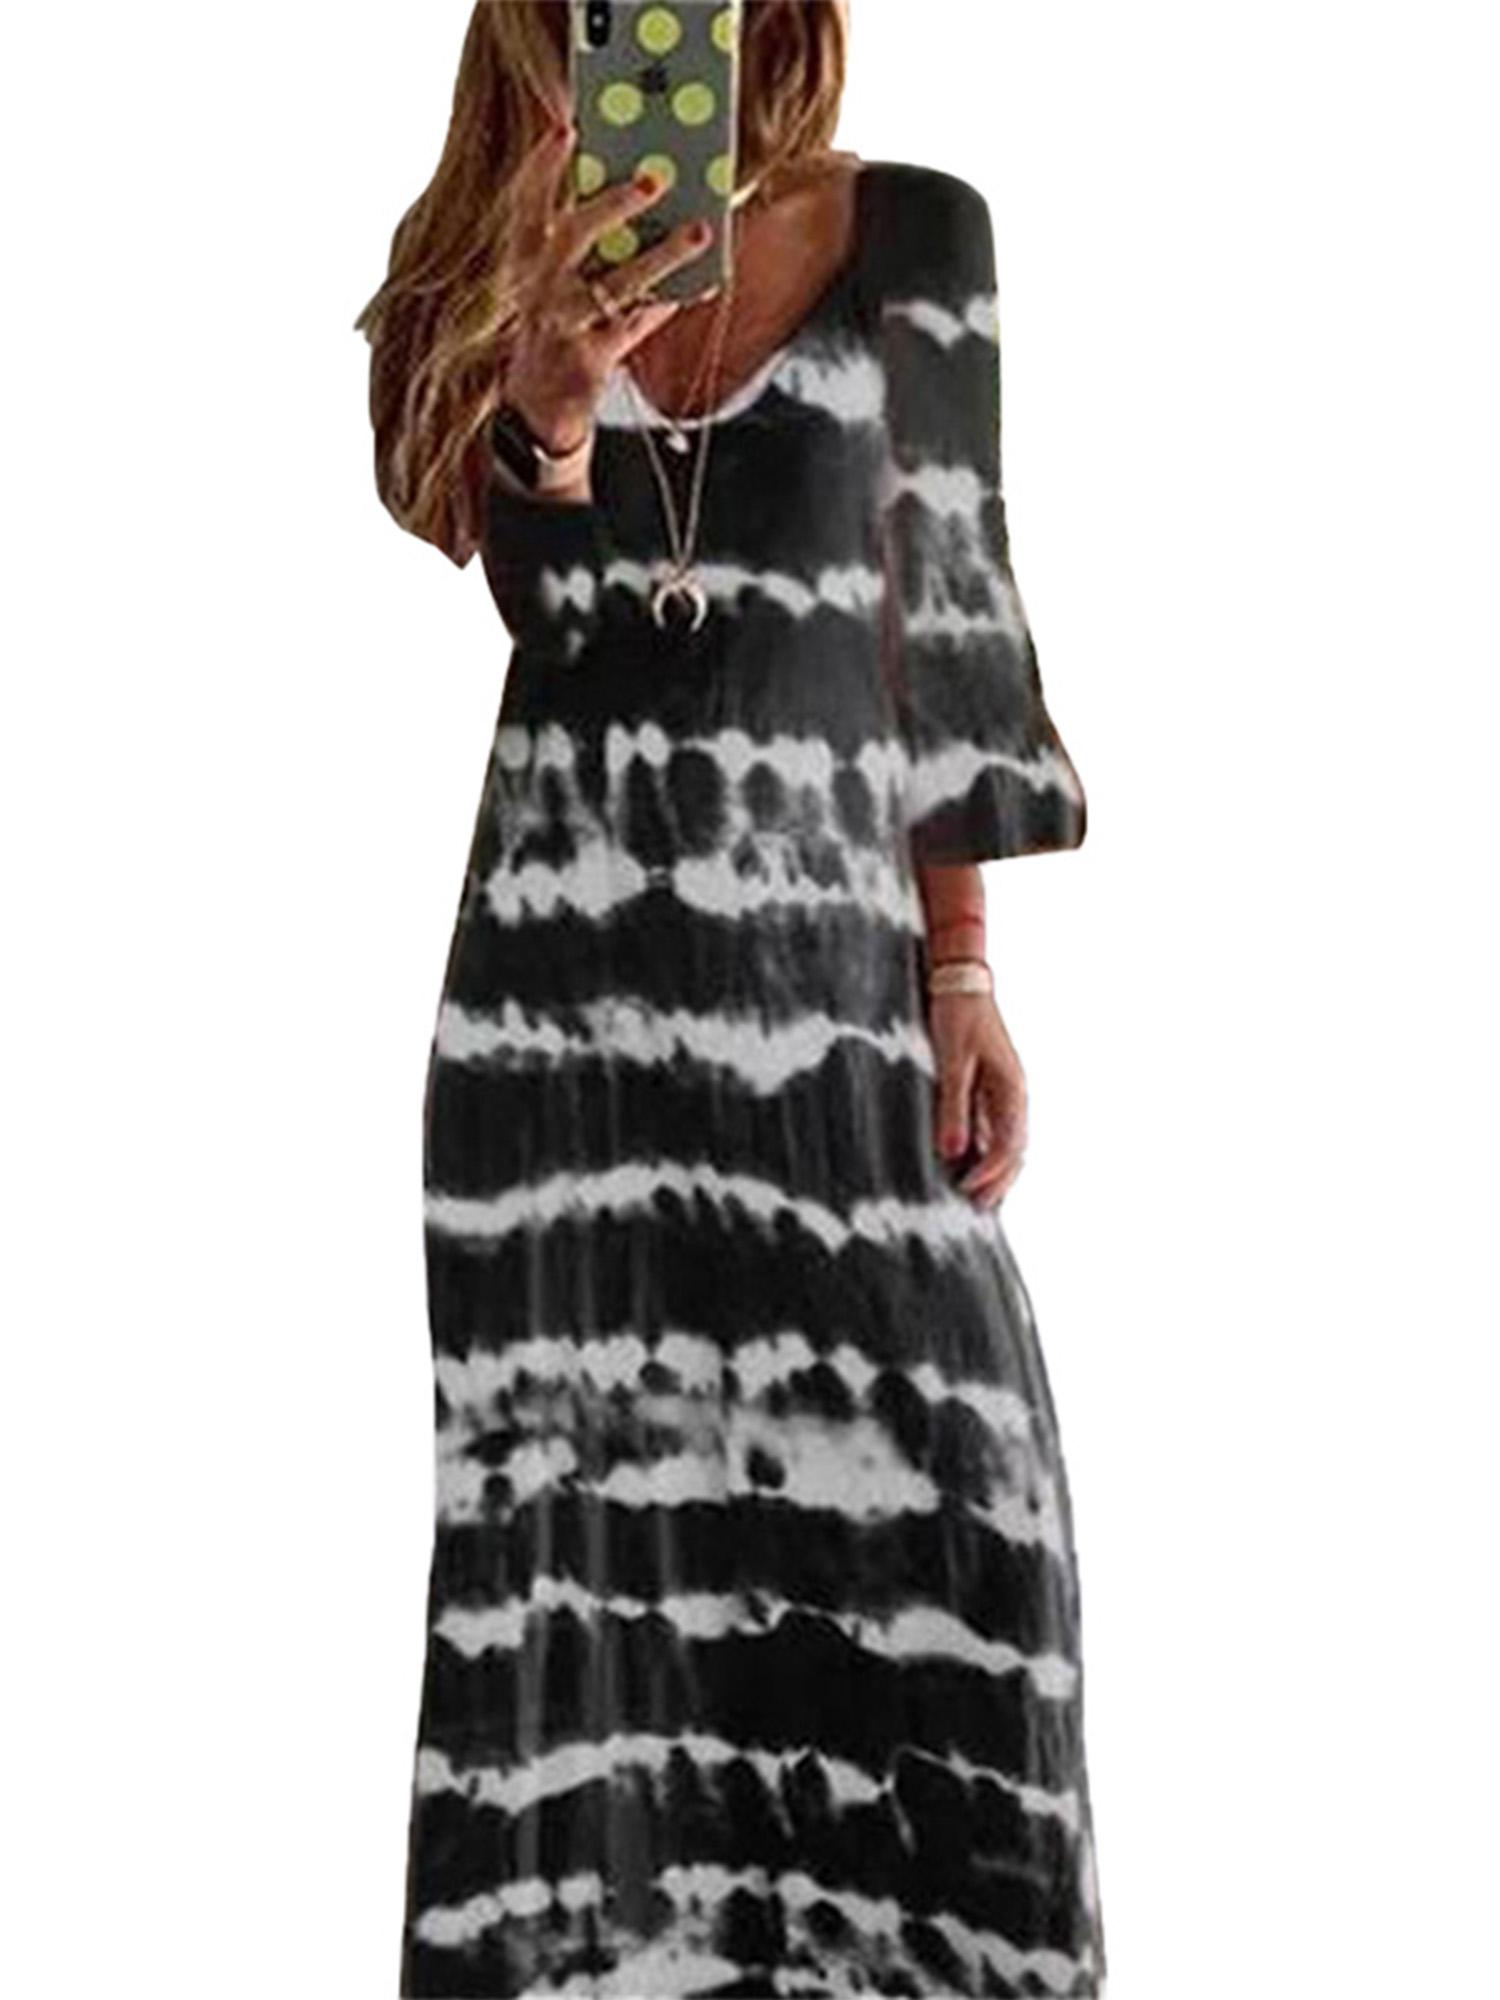 Pink cotton stripe long kaftan loungewear bridesmaid dress maternity wife gift anniversary plus size maxi boho tunic sleepwear dressing gown